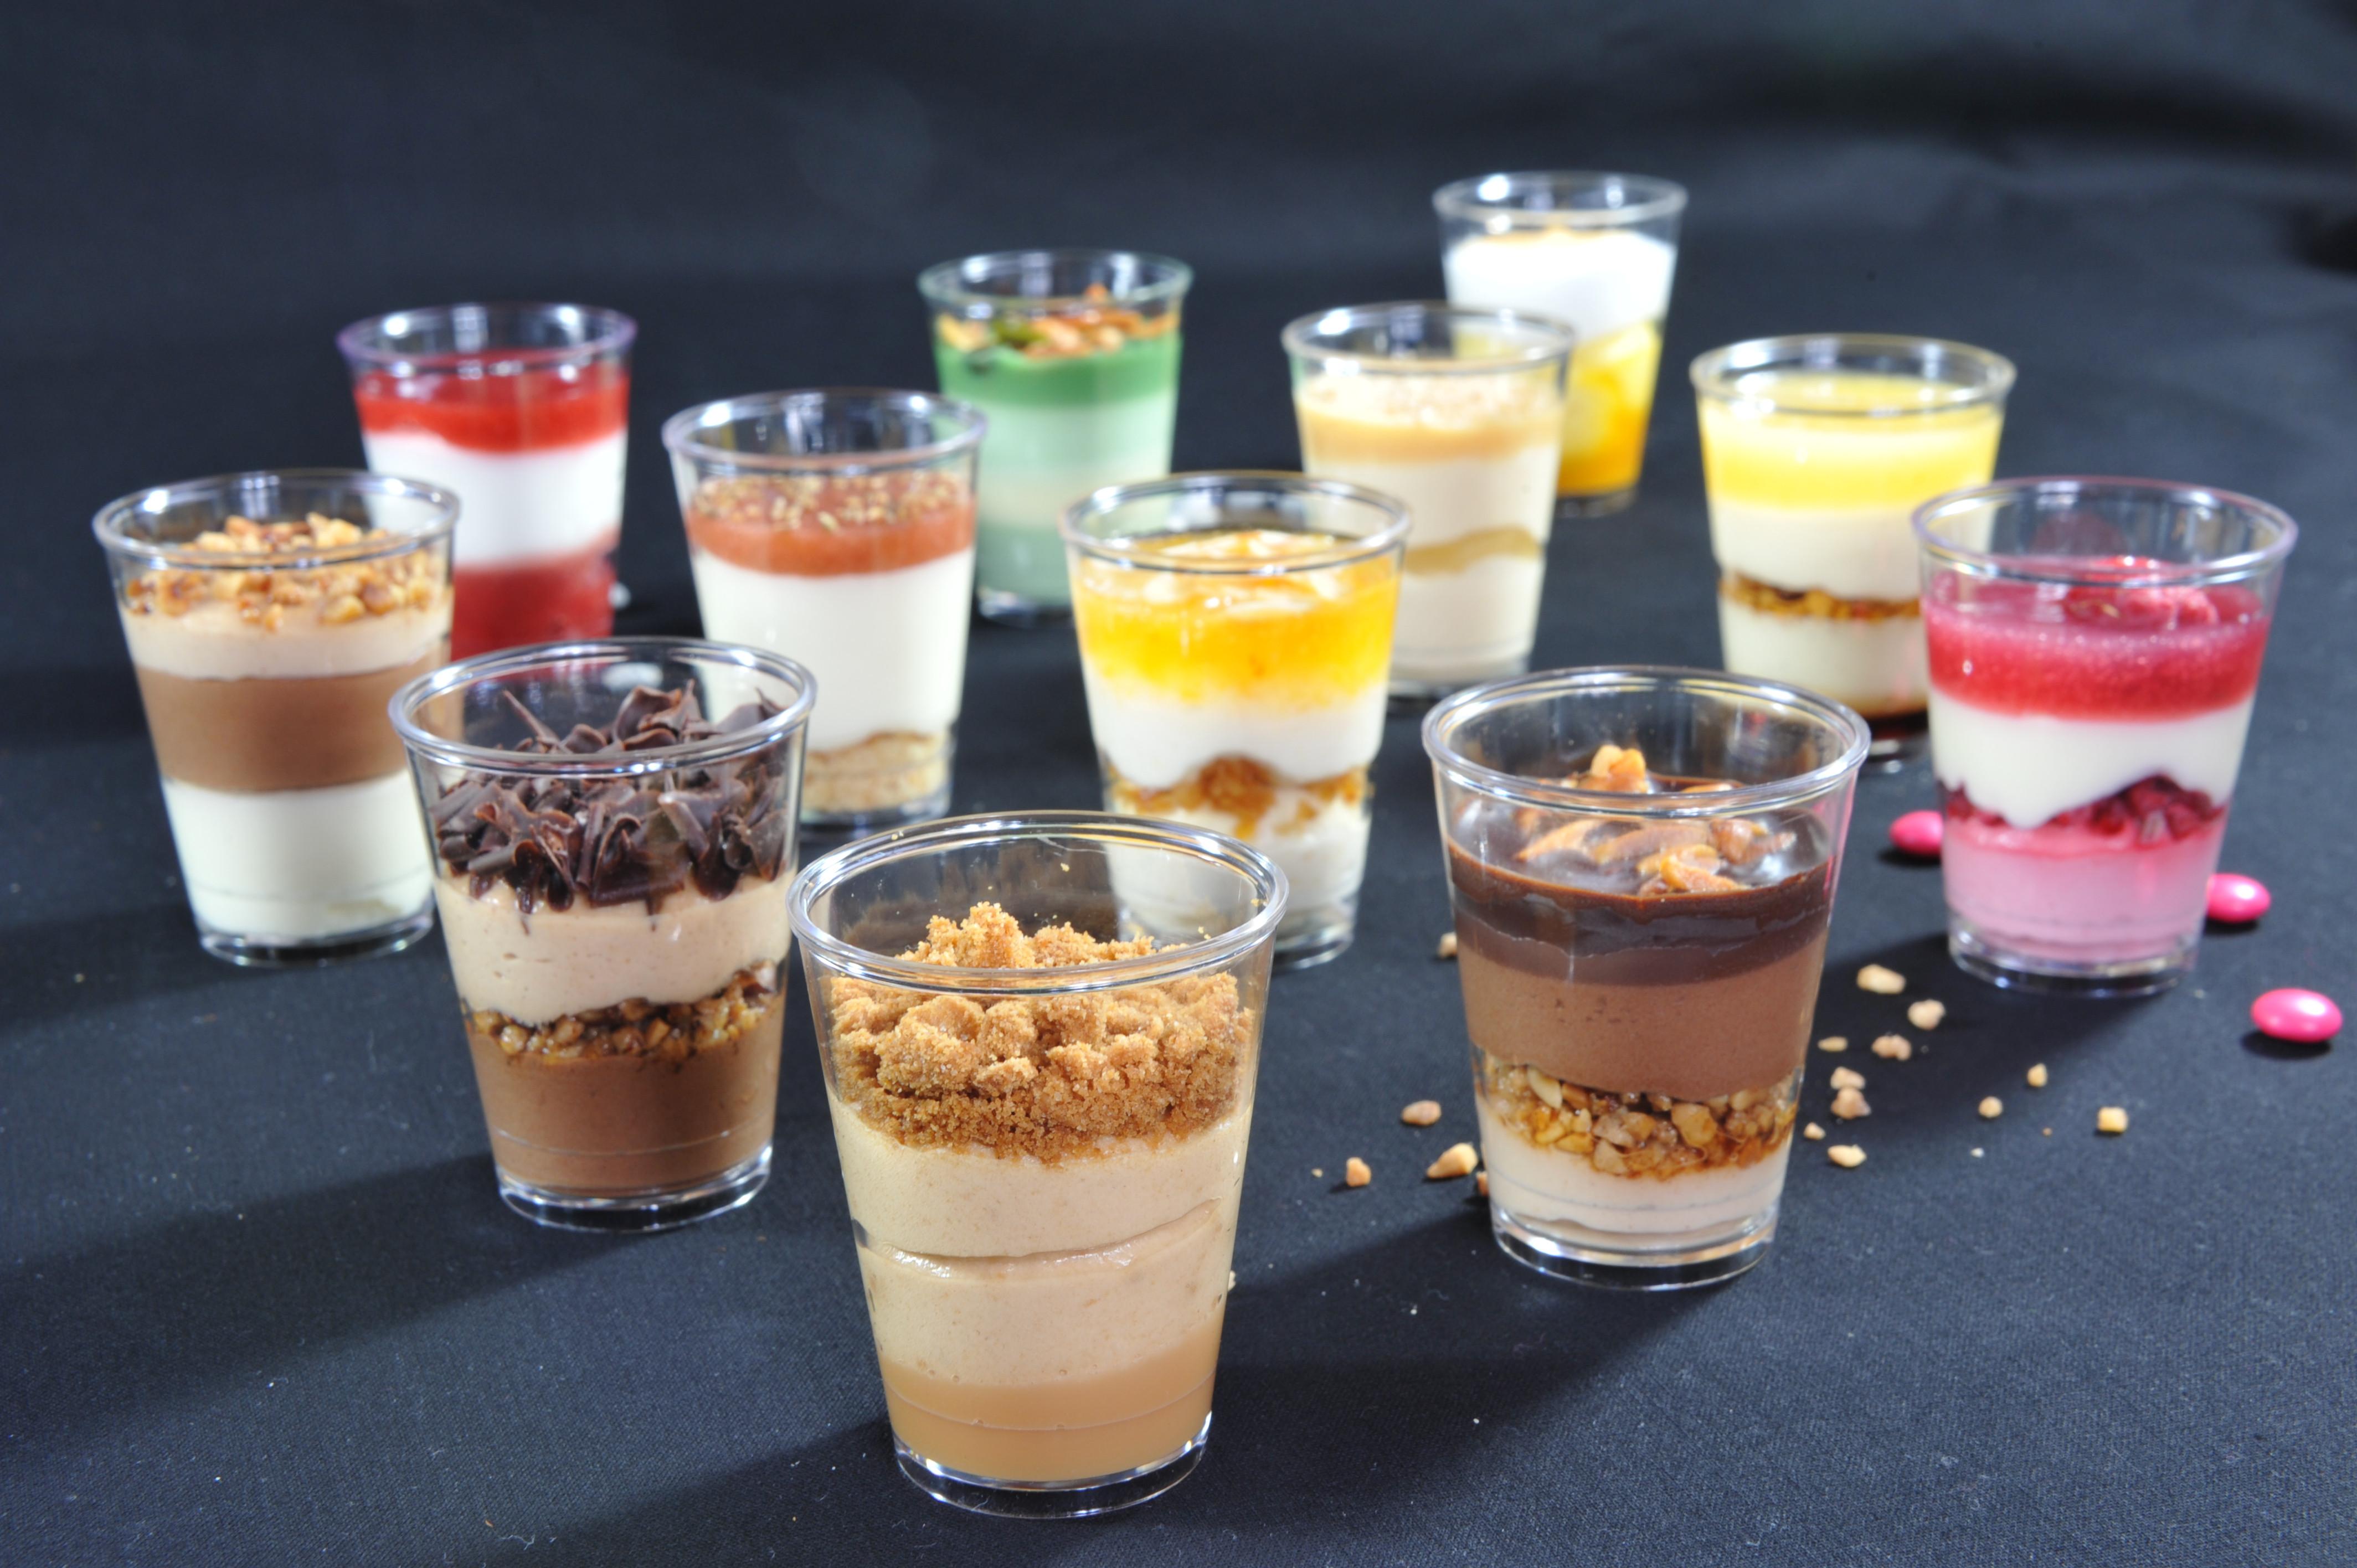 Mini Dessert Glasses  Rolph & Rolph individual desserts shot glasses and verrines